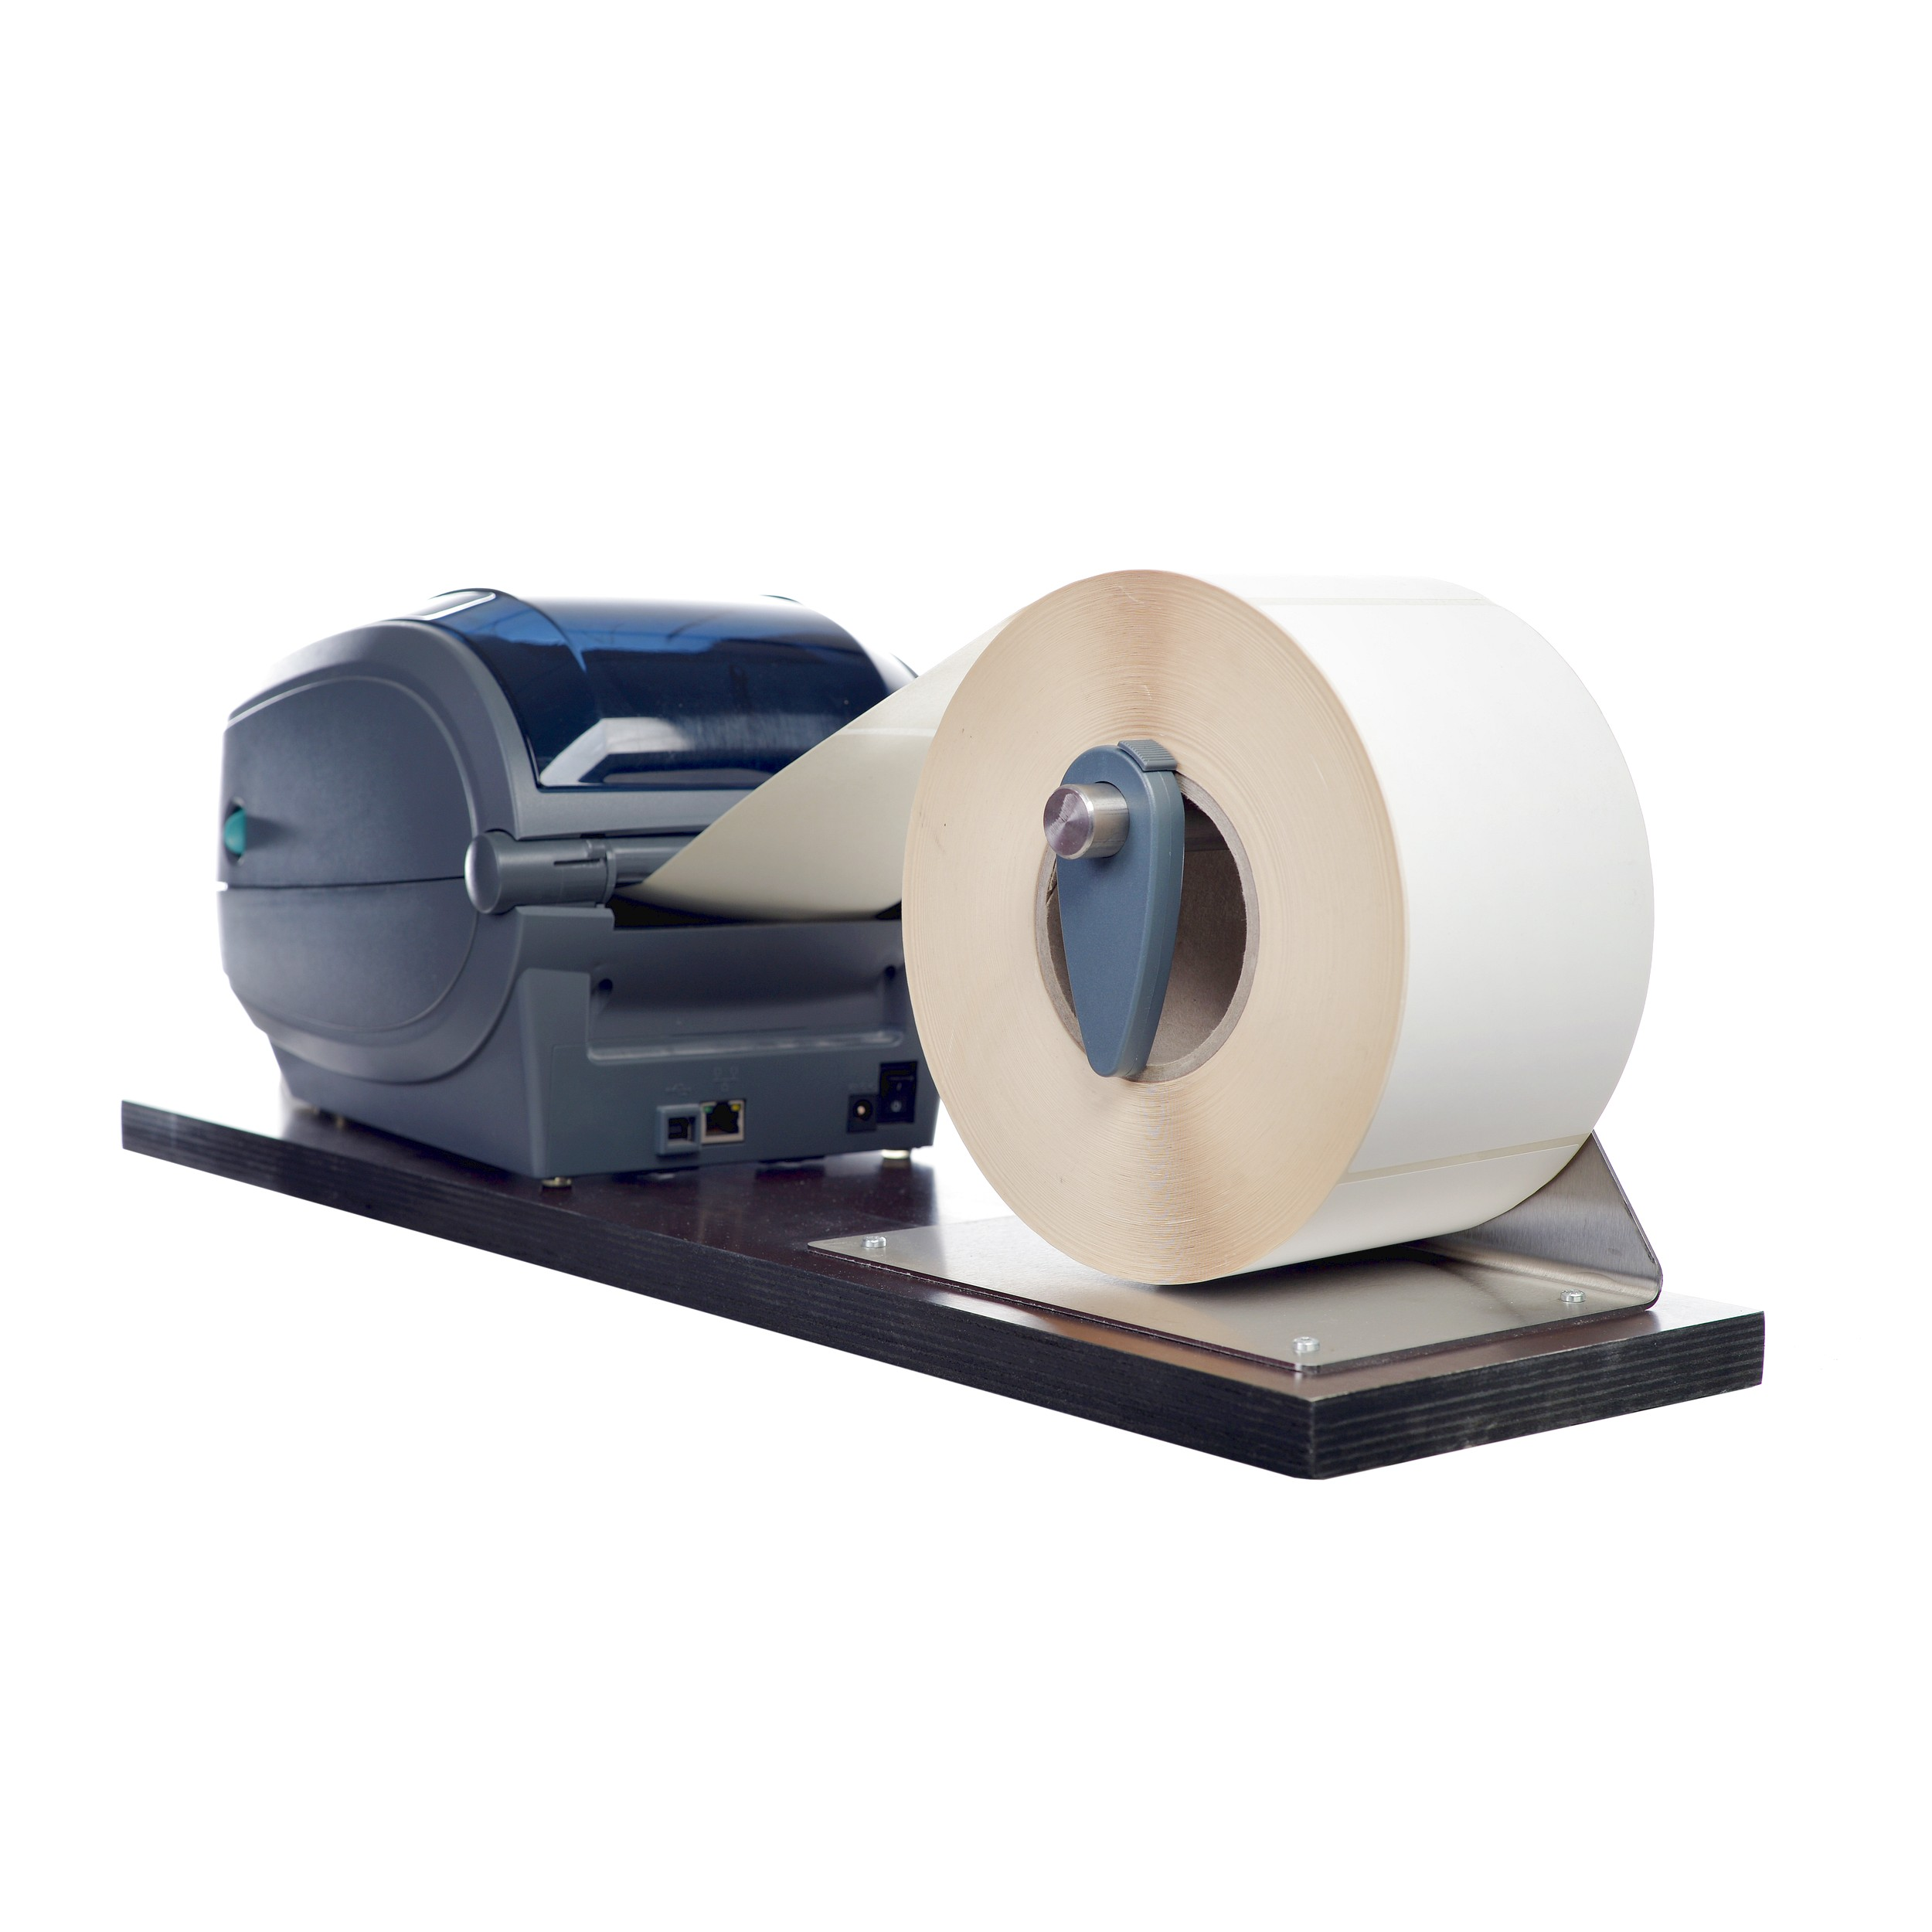 Etikettendrucker Etiketten Drucken Rolle Versandetiketten Rollenhalterung Halterung Versand Logistik Hardware 3